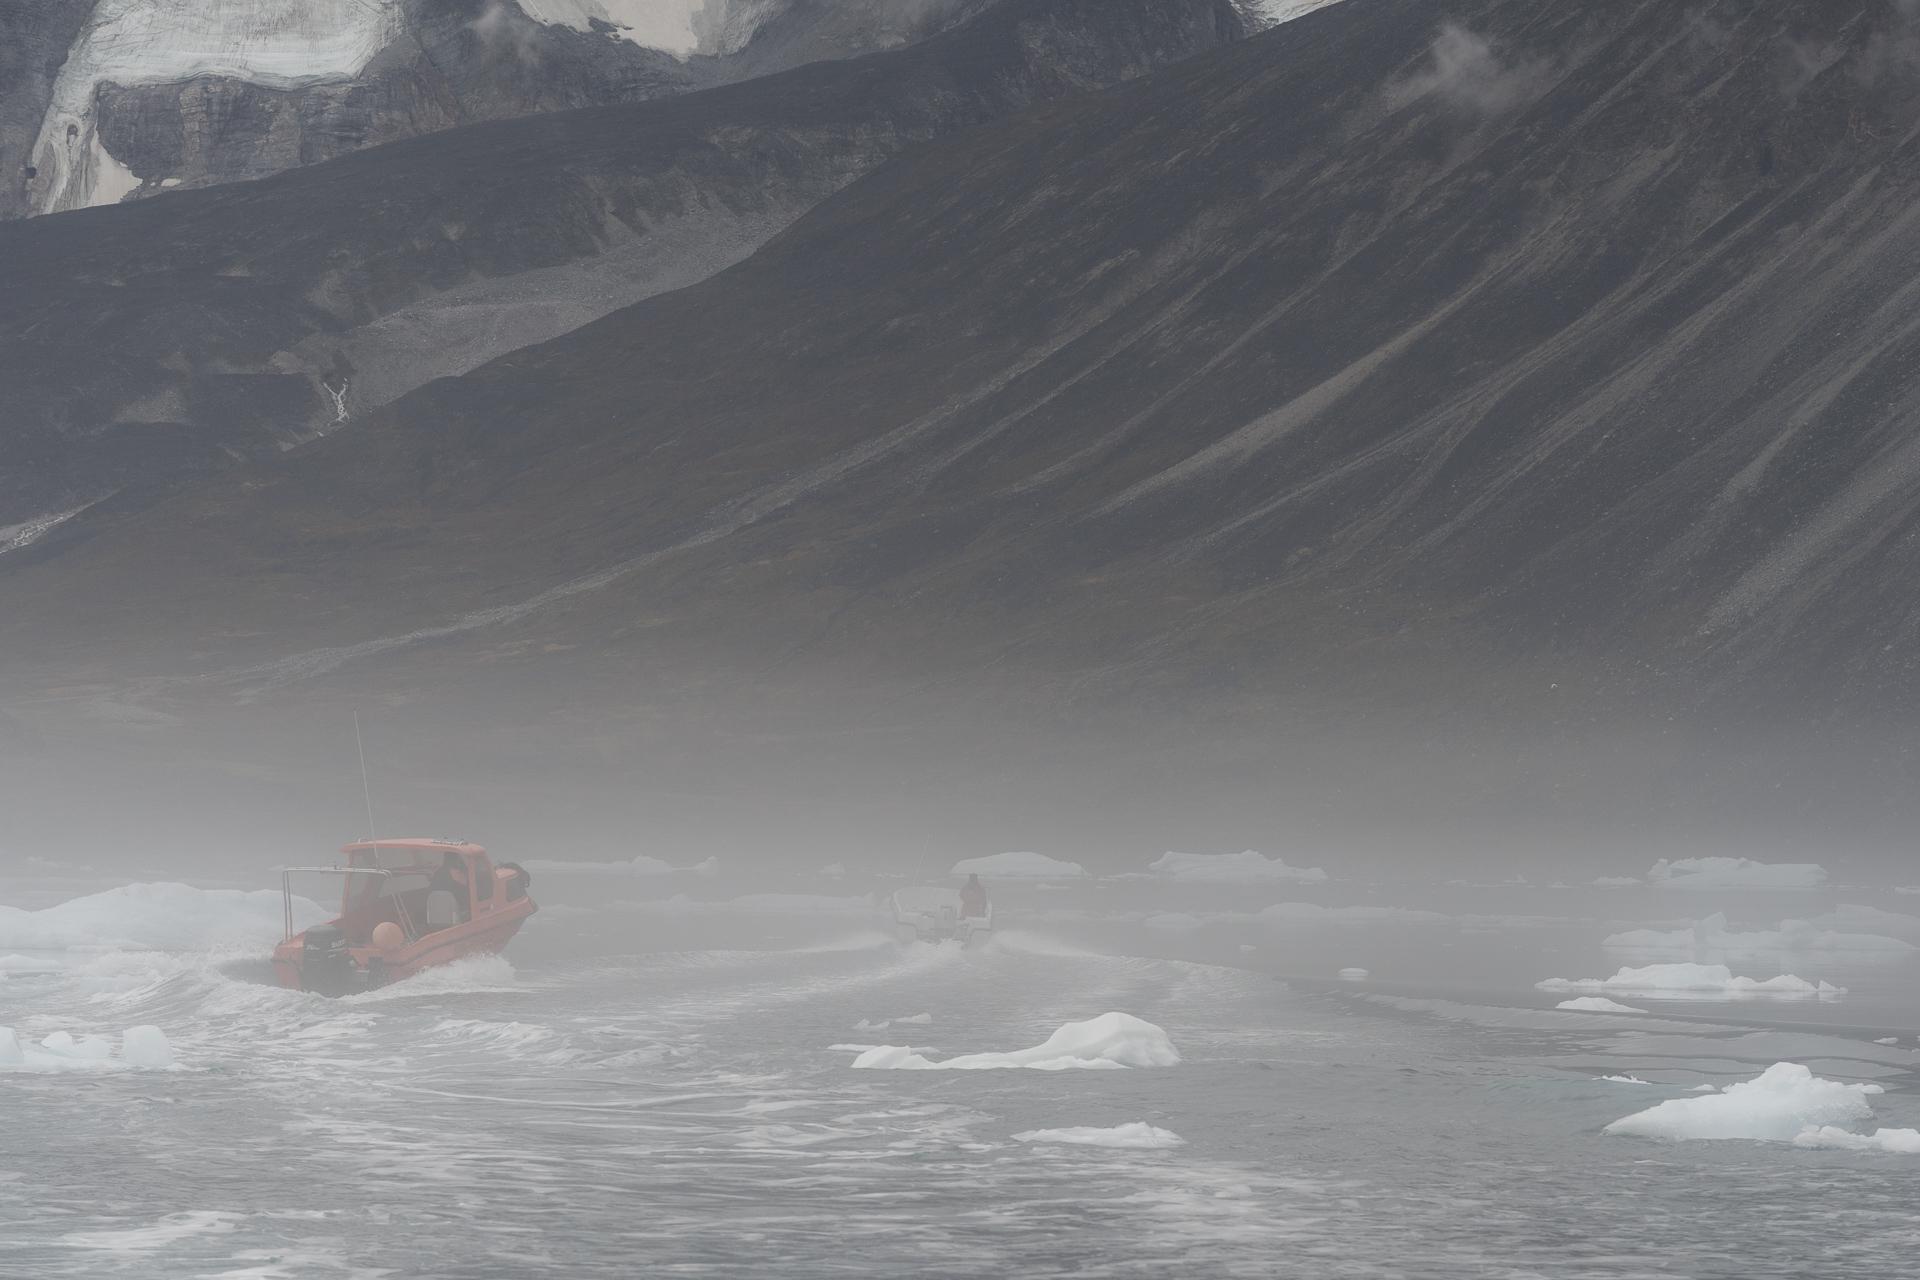 9.Defibaugh_Greenland_Uummannaq_a_17.jpg